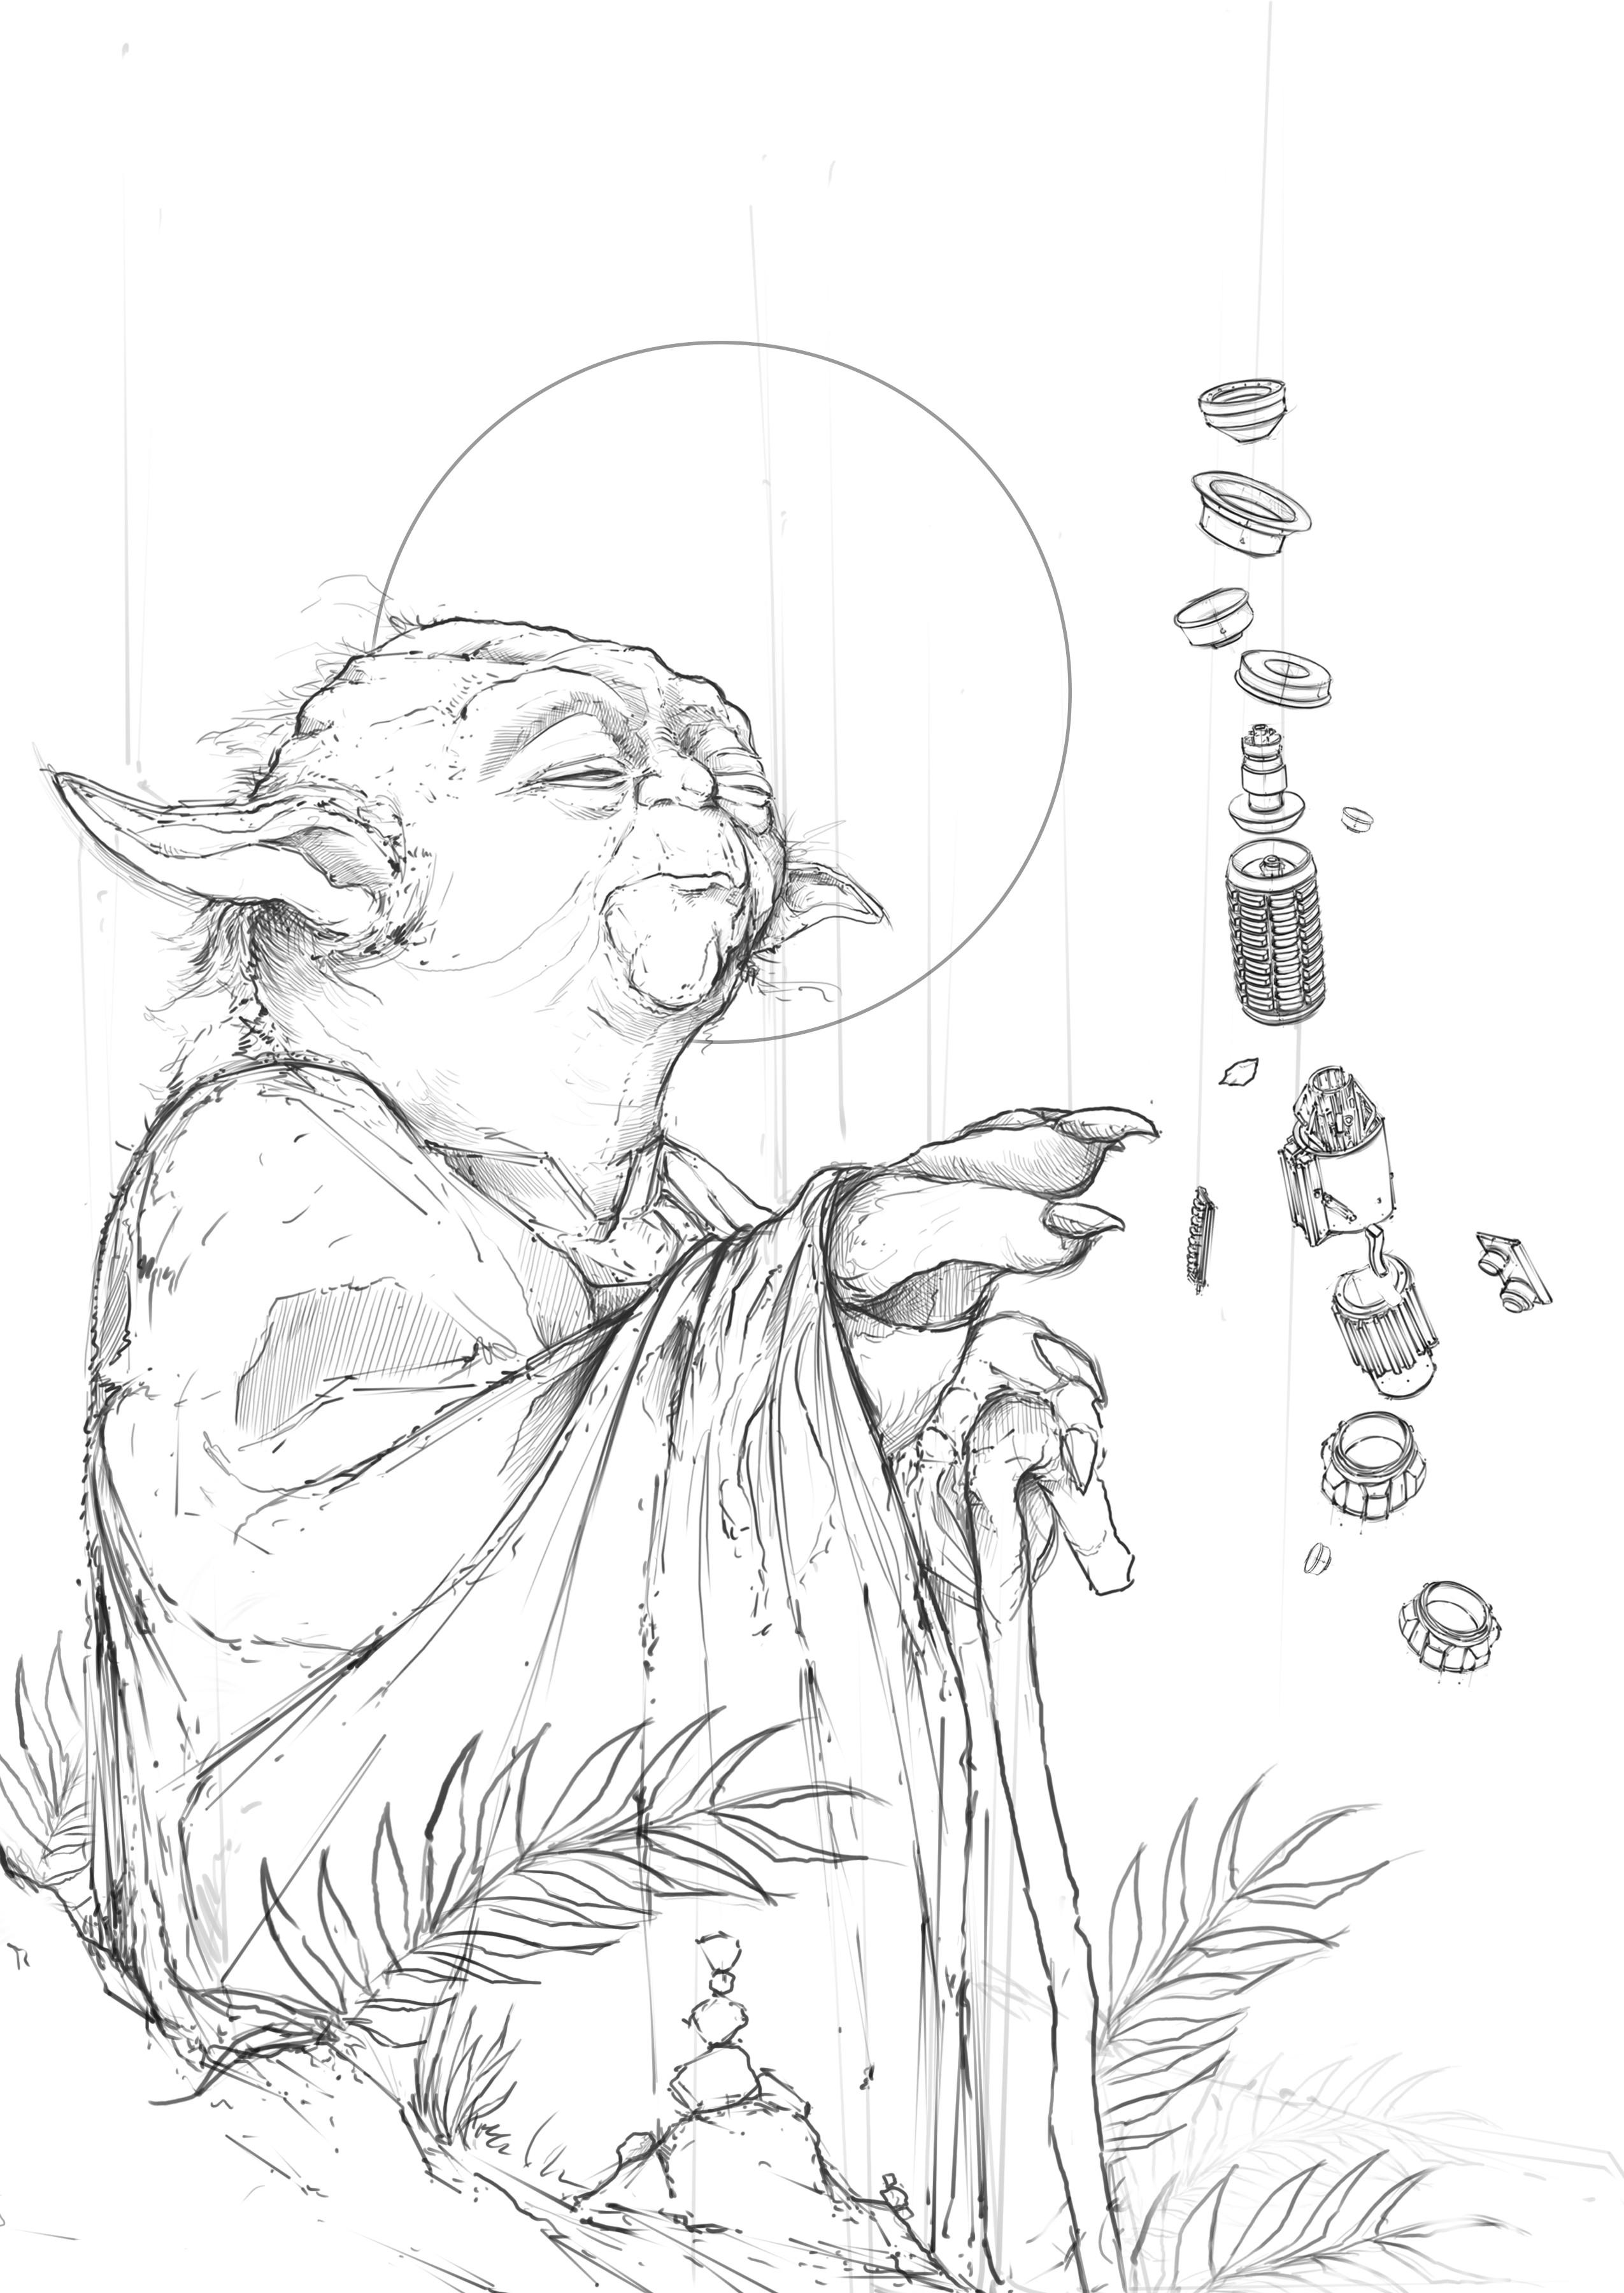 Yoda Constructing Sketch 1